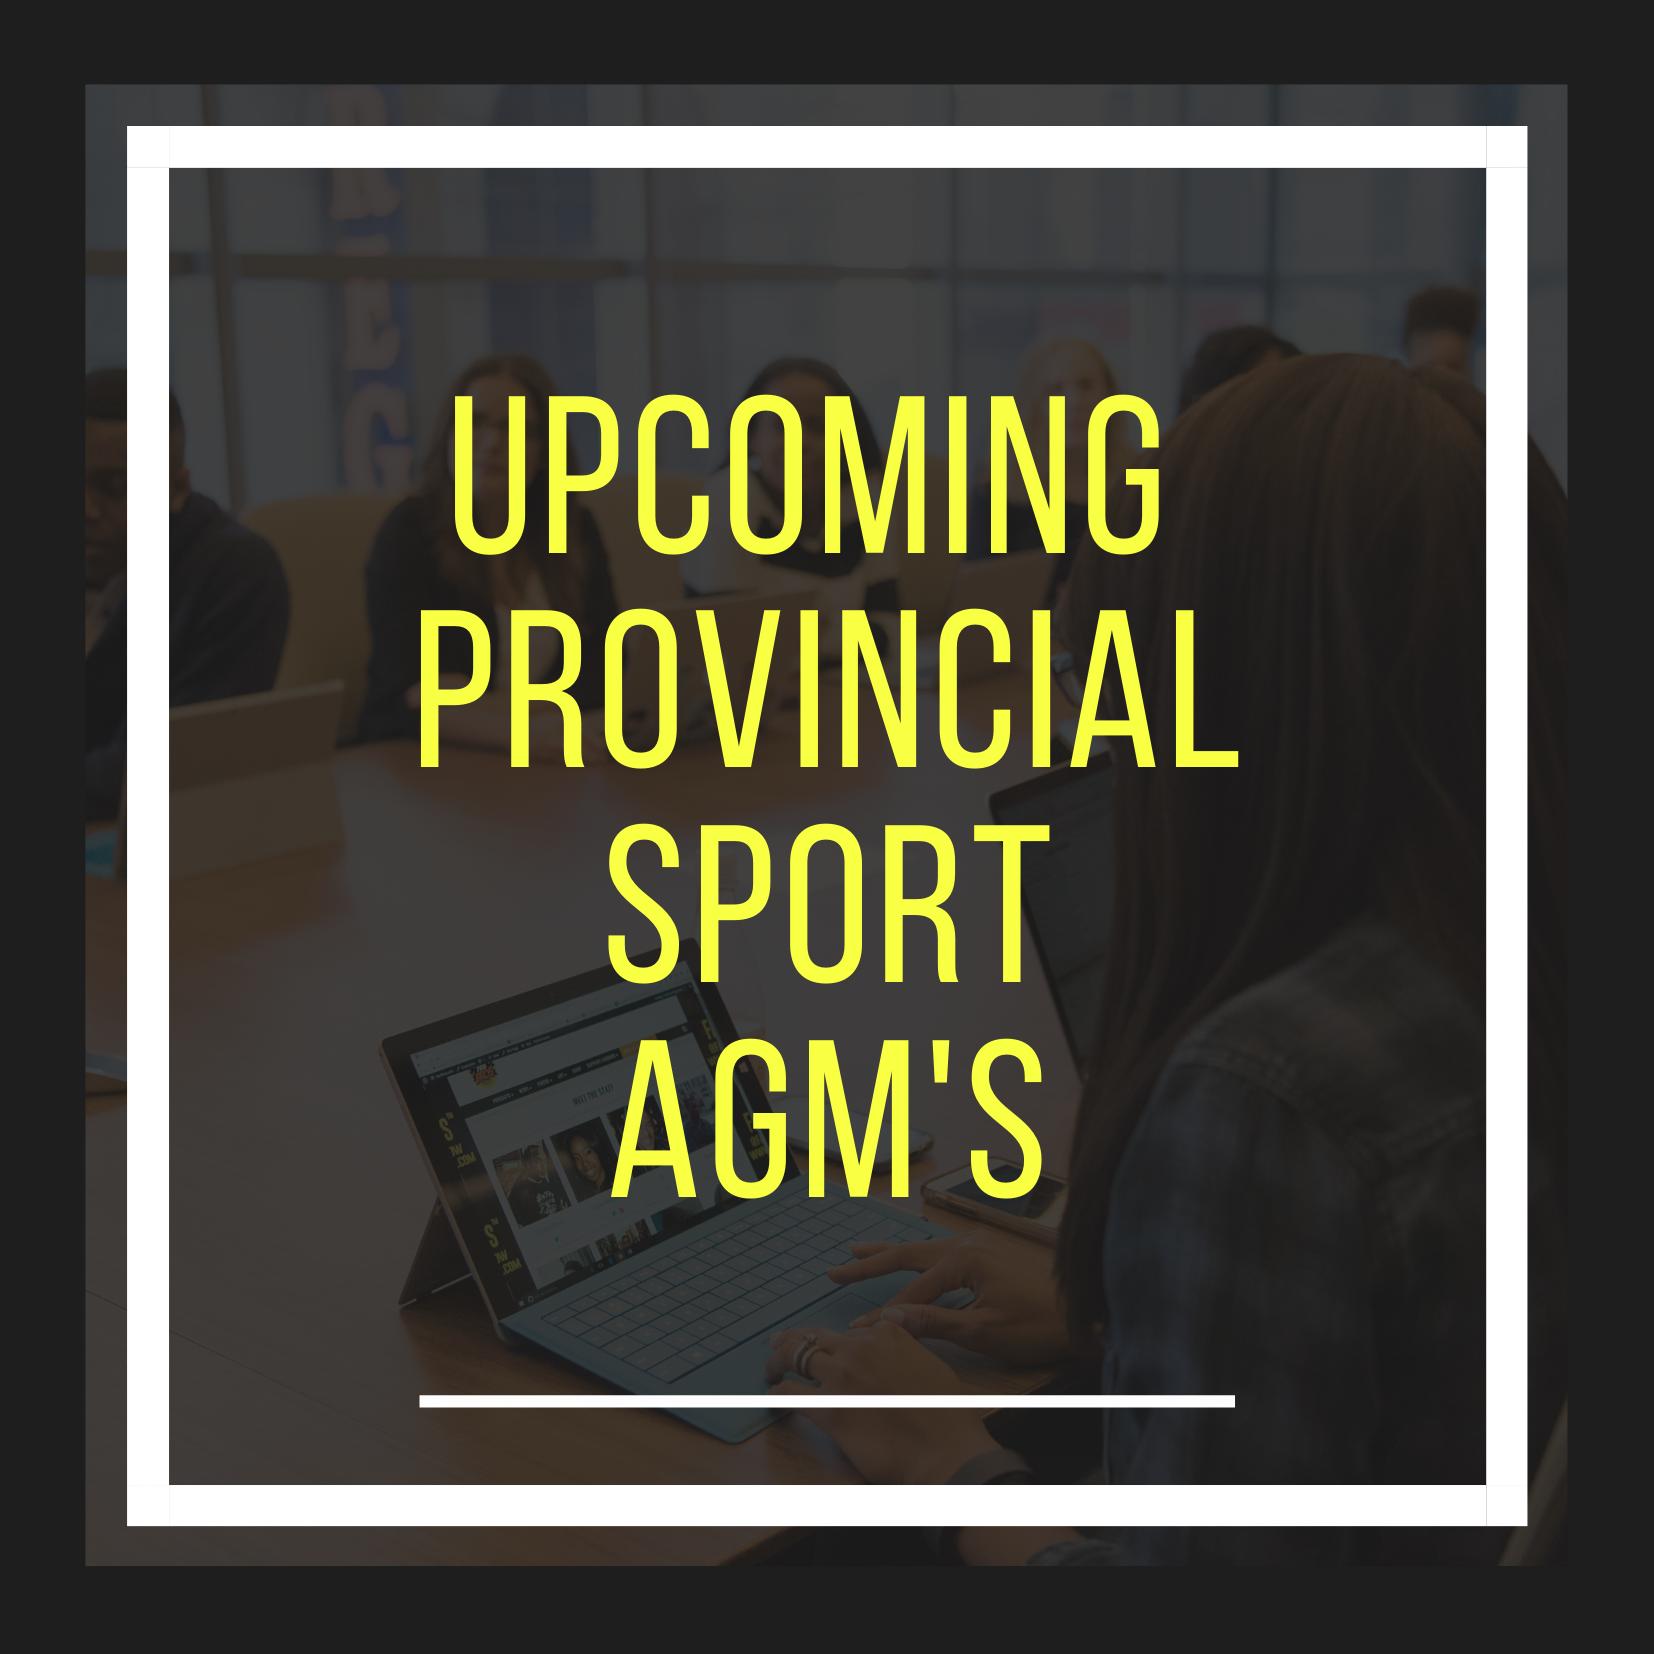 Upcoming Provincial Sport Annual General Meetings